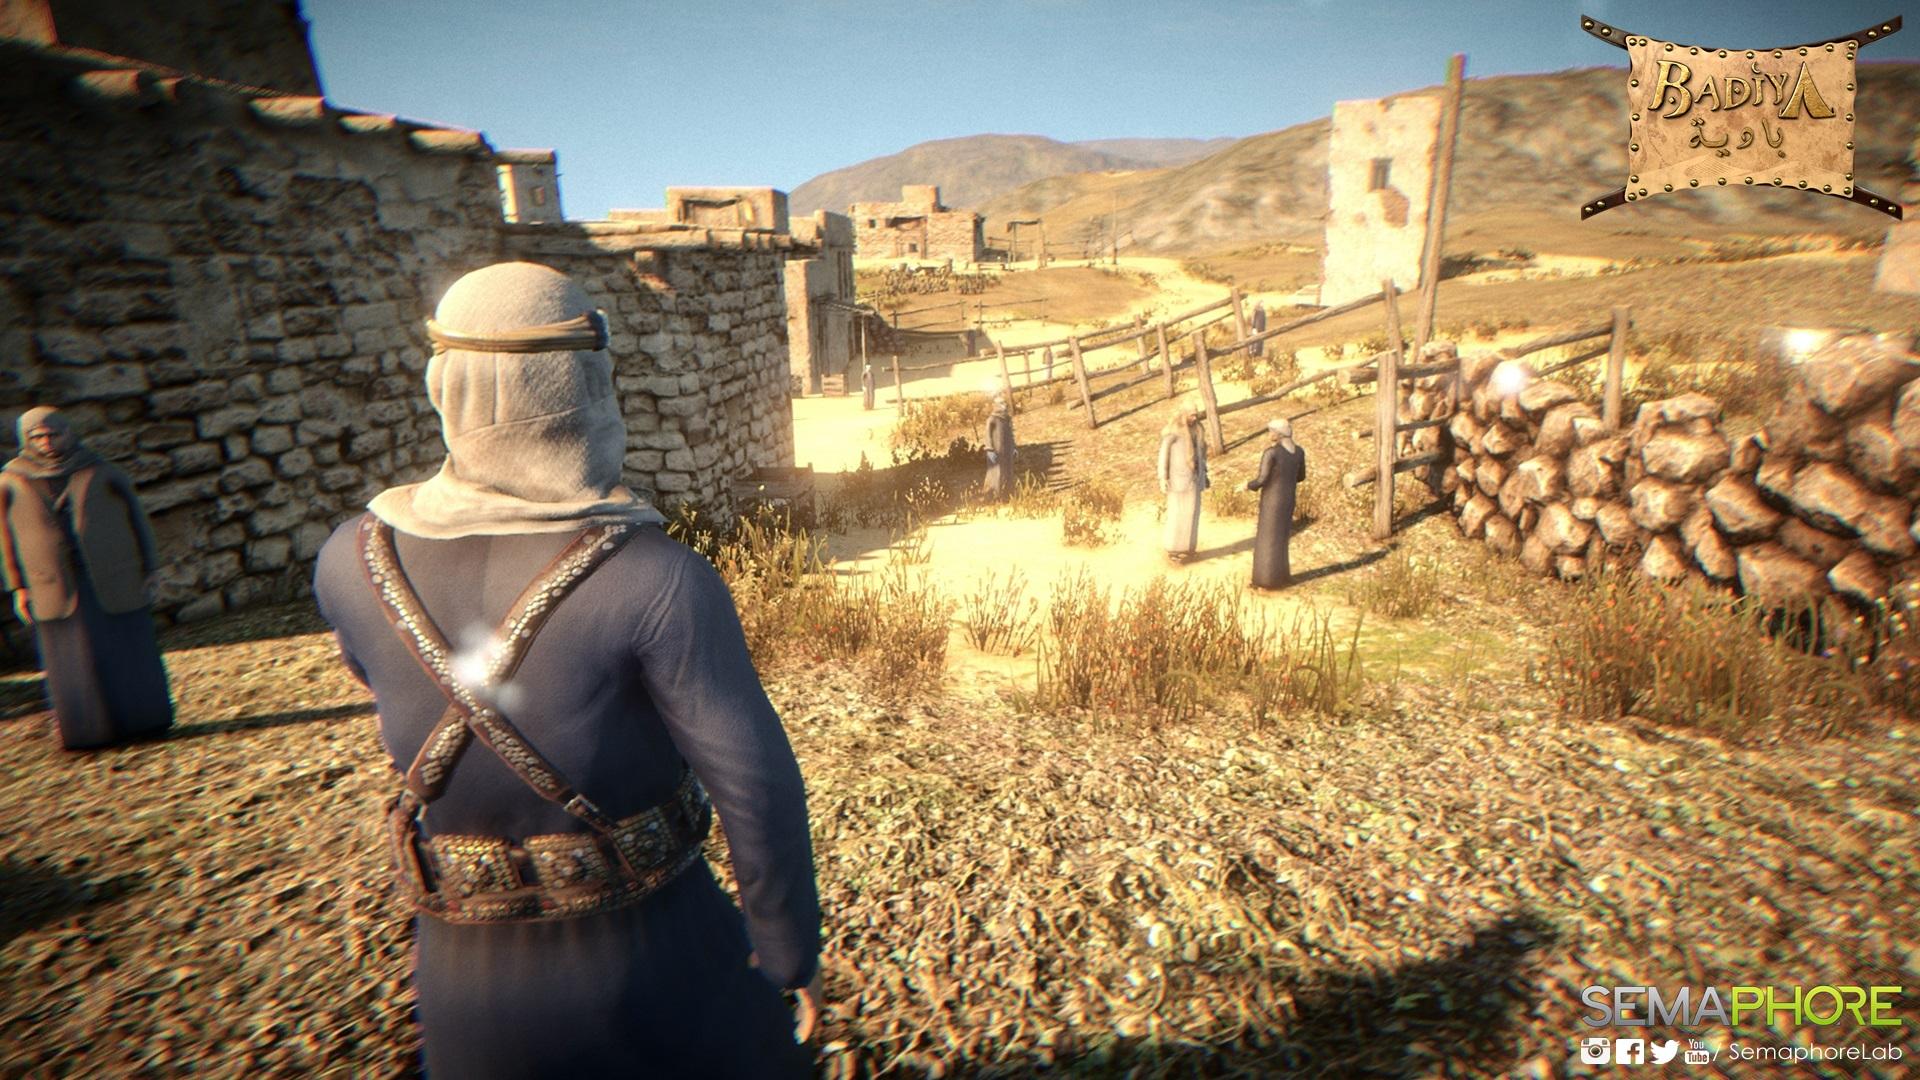 """Badiya"" Challenges Existing Representation of Arabs in Games"